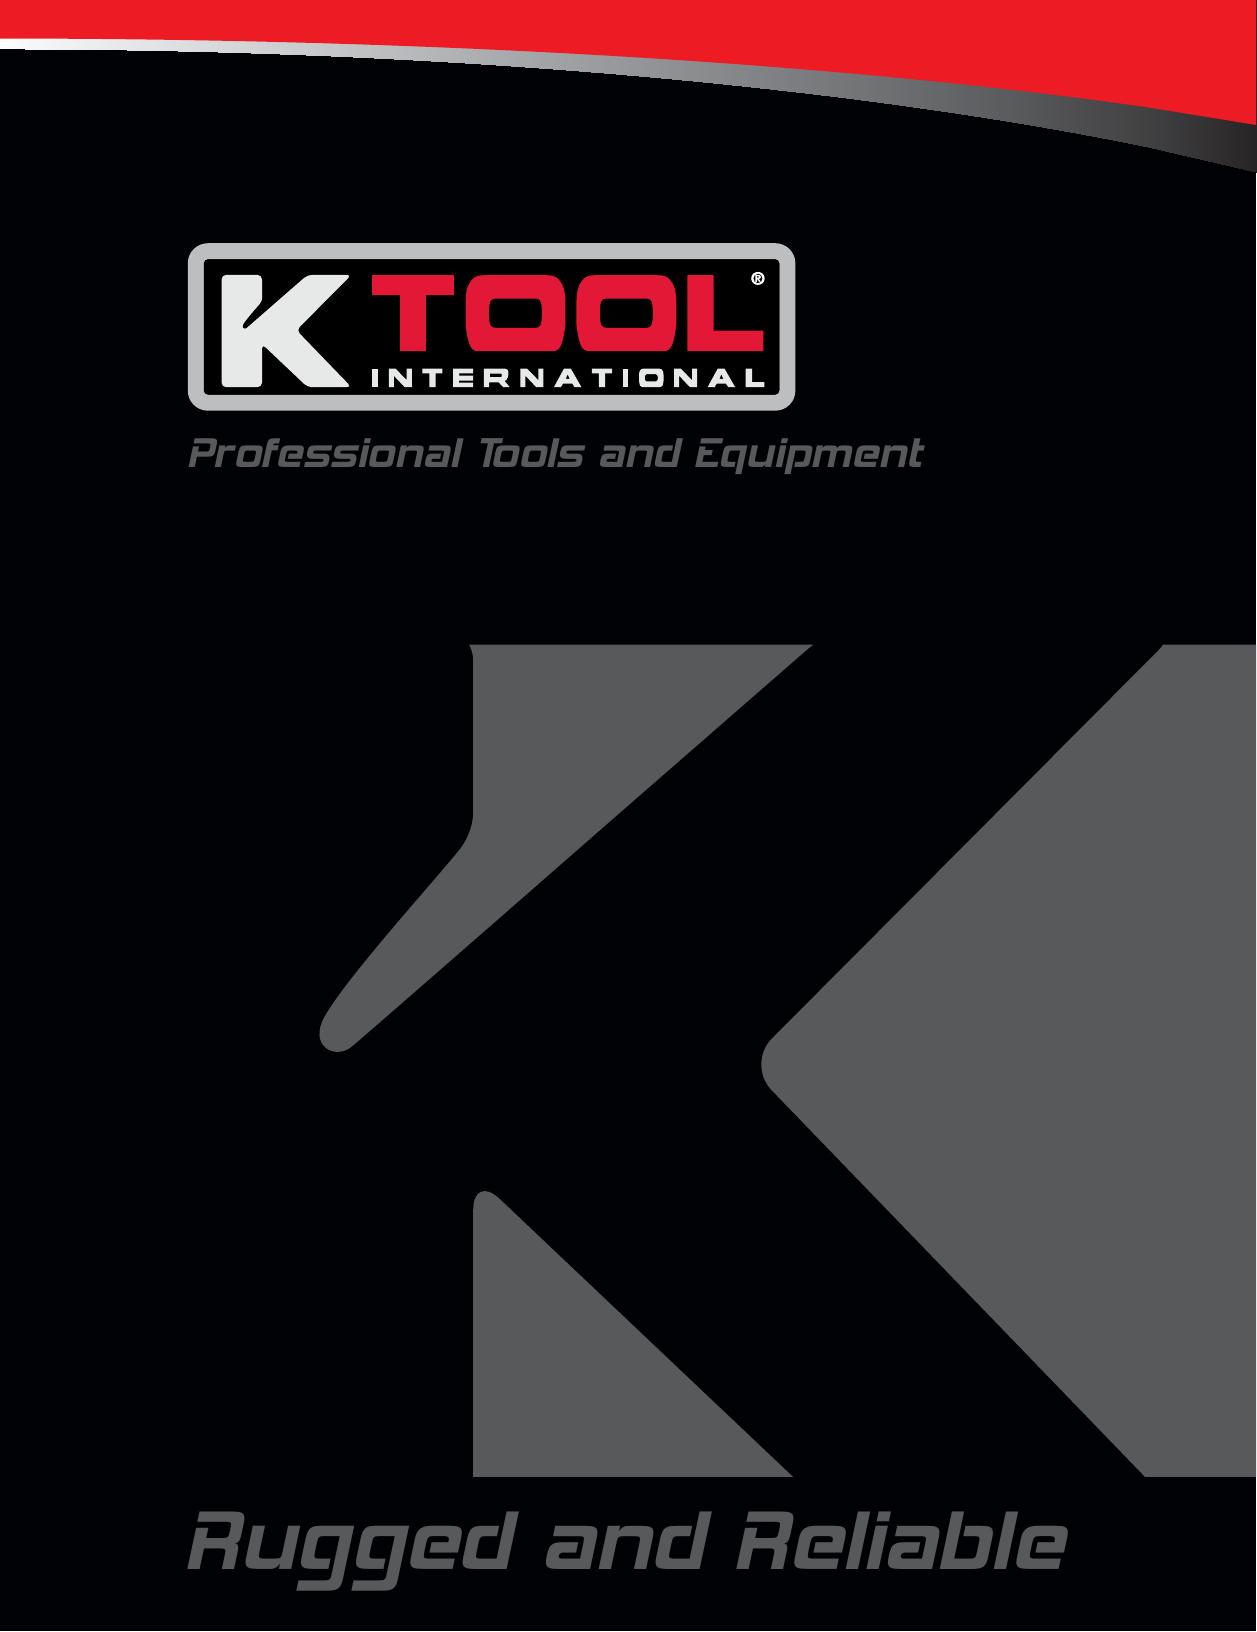 K-Tool International KTI KTI19713 Screwdriver #1 Phillips Orange